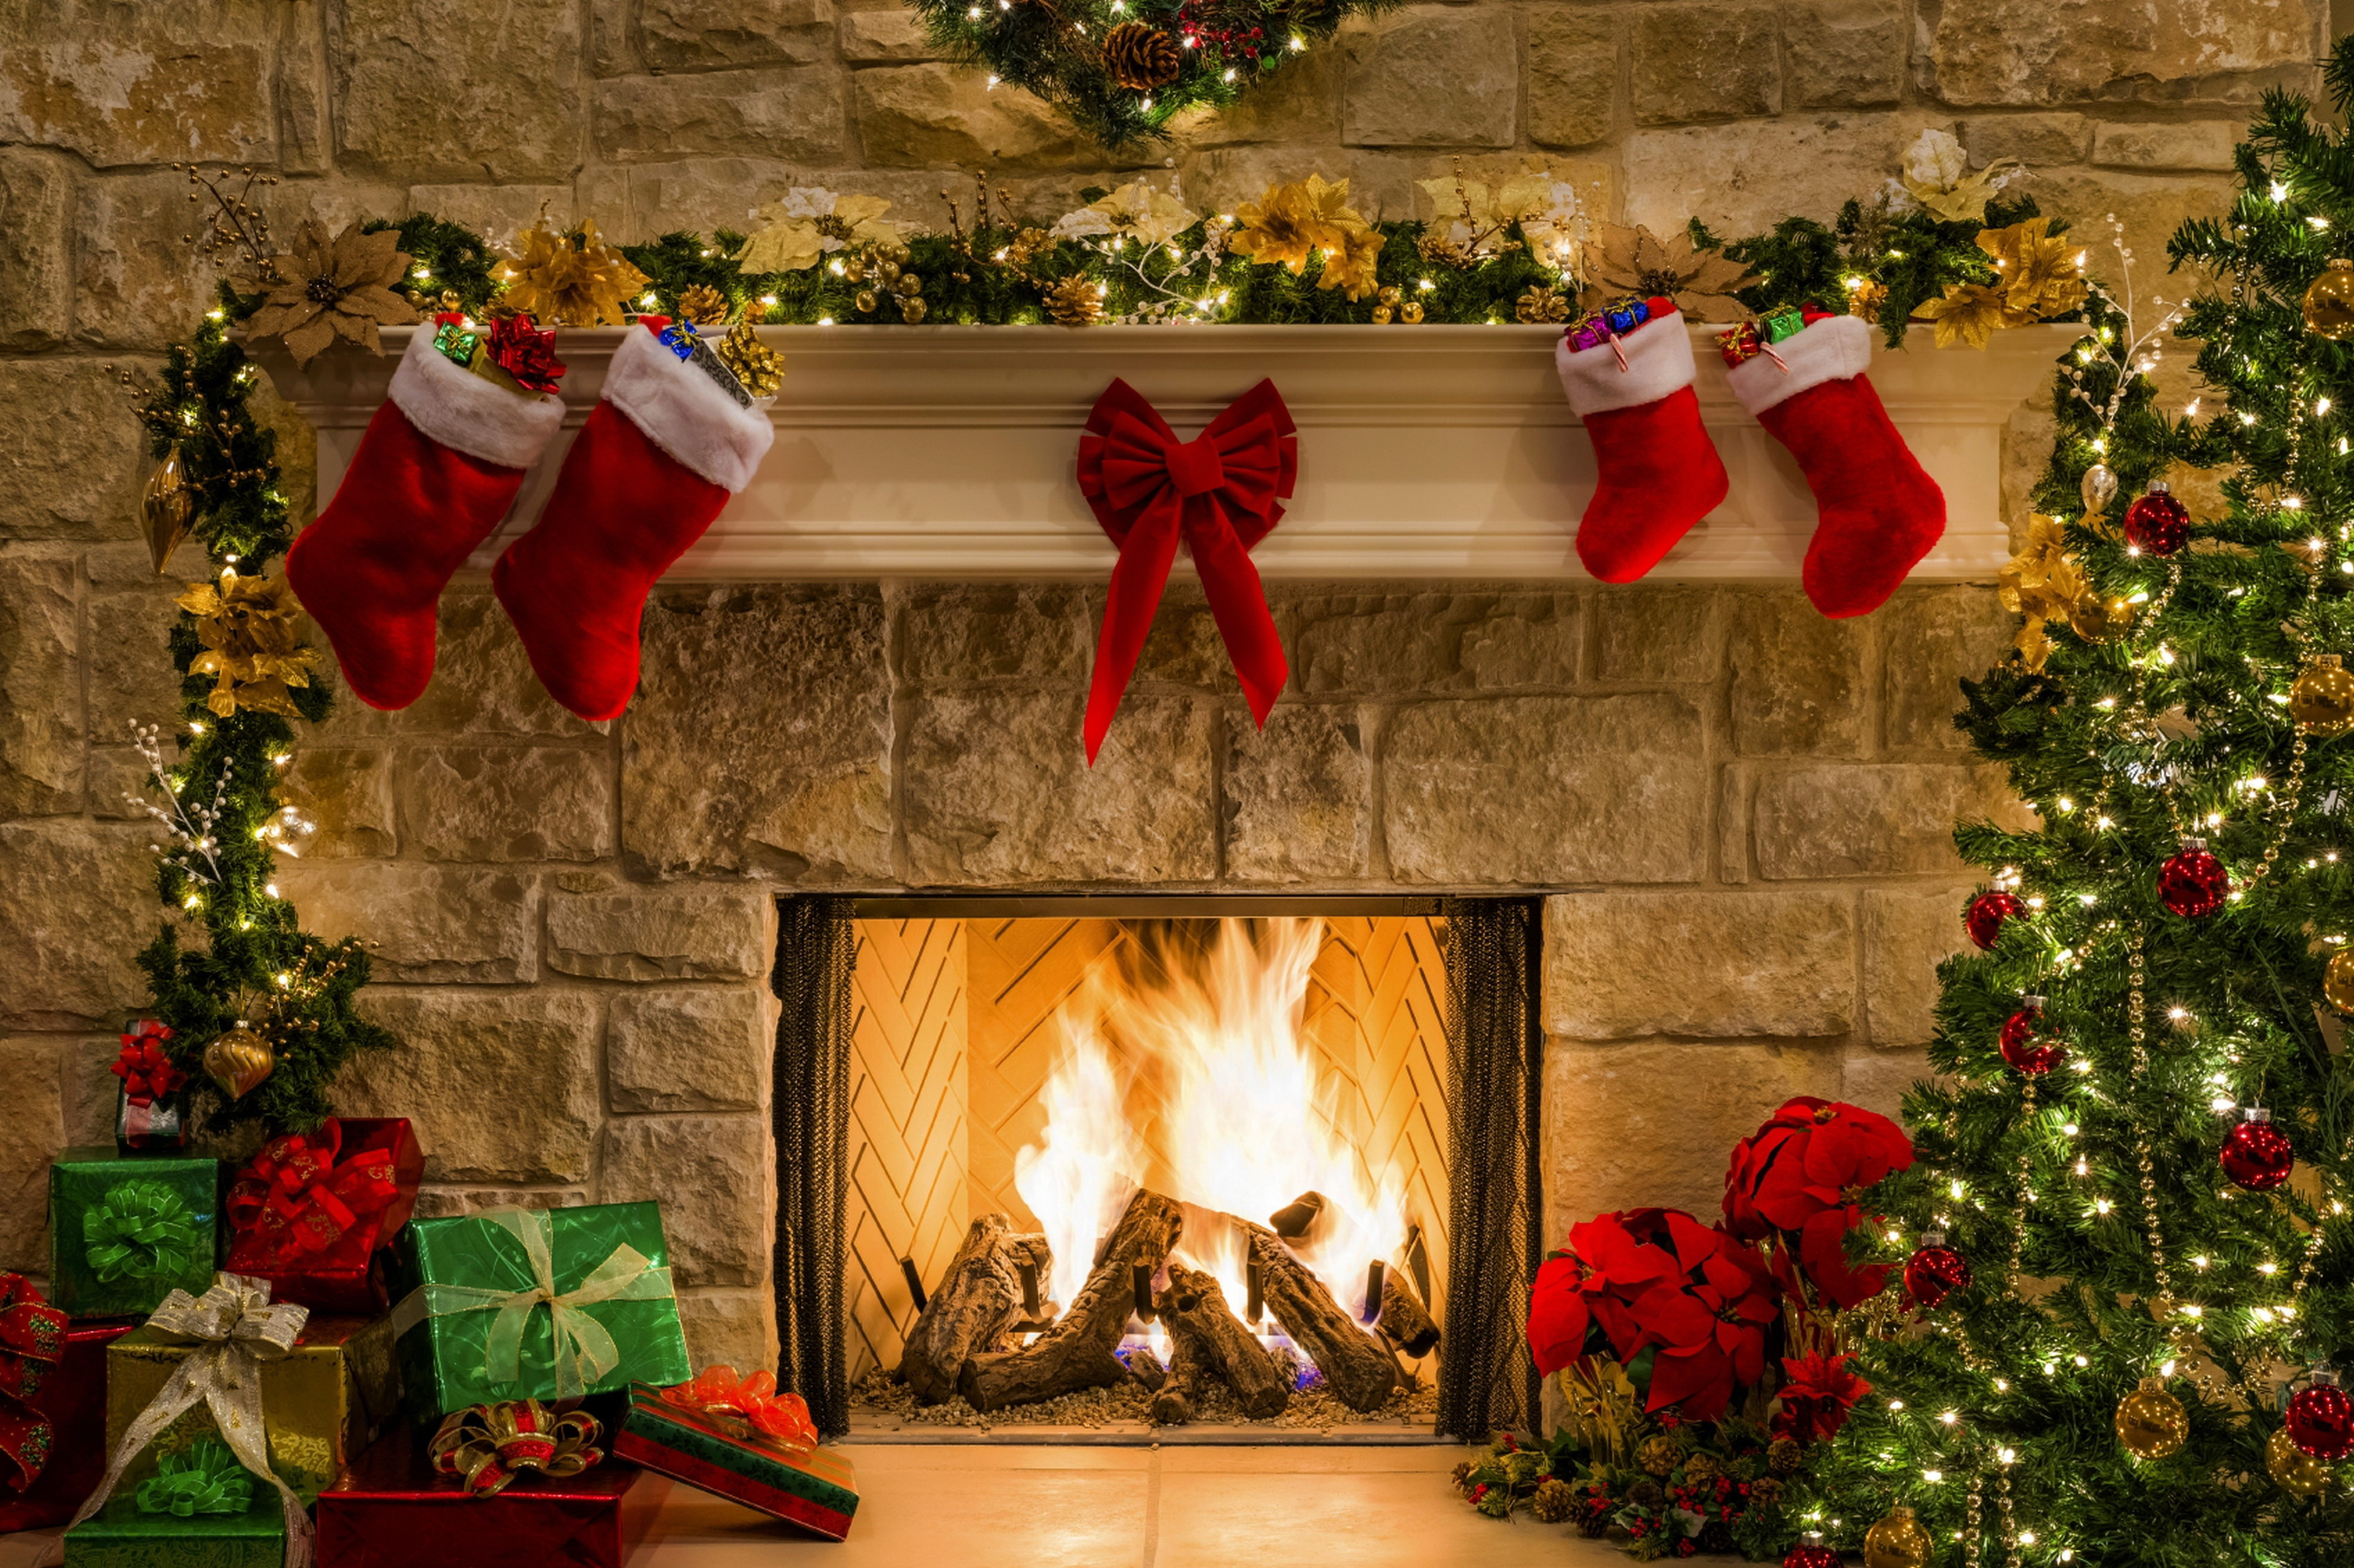 Christmas Wallpaper Fireplace  Fireplace & Knit Christmas Stockings